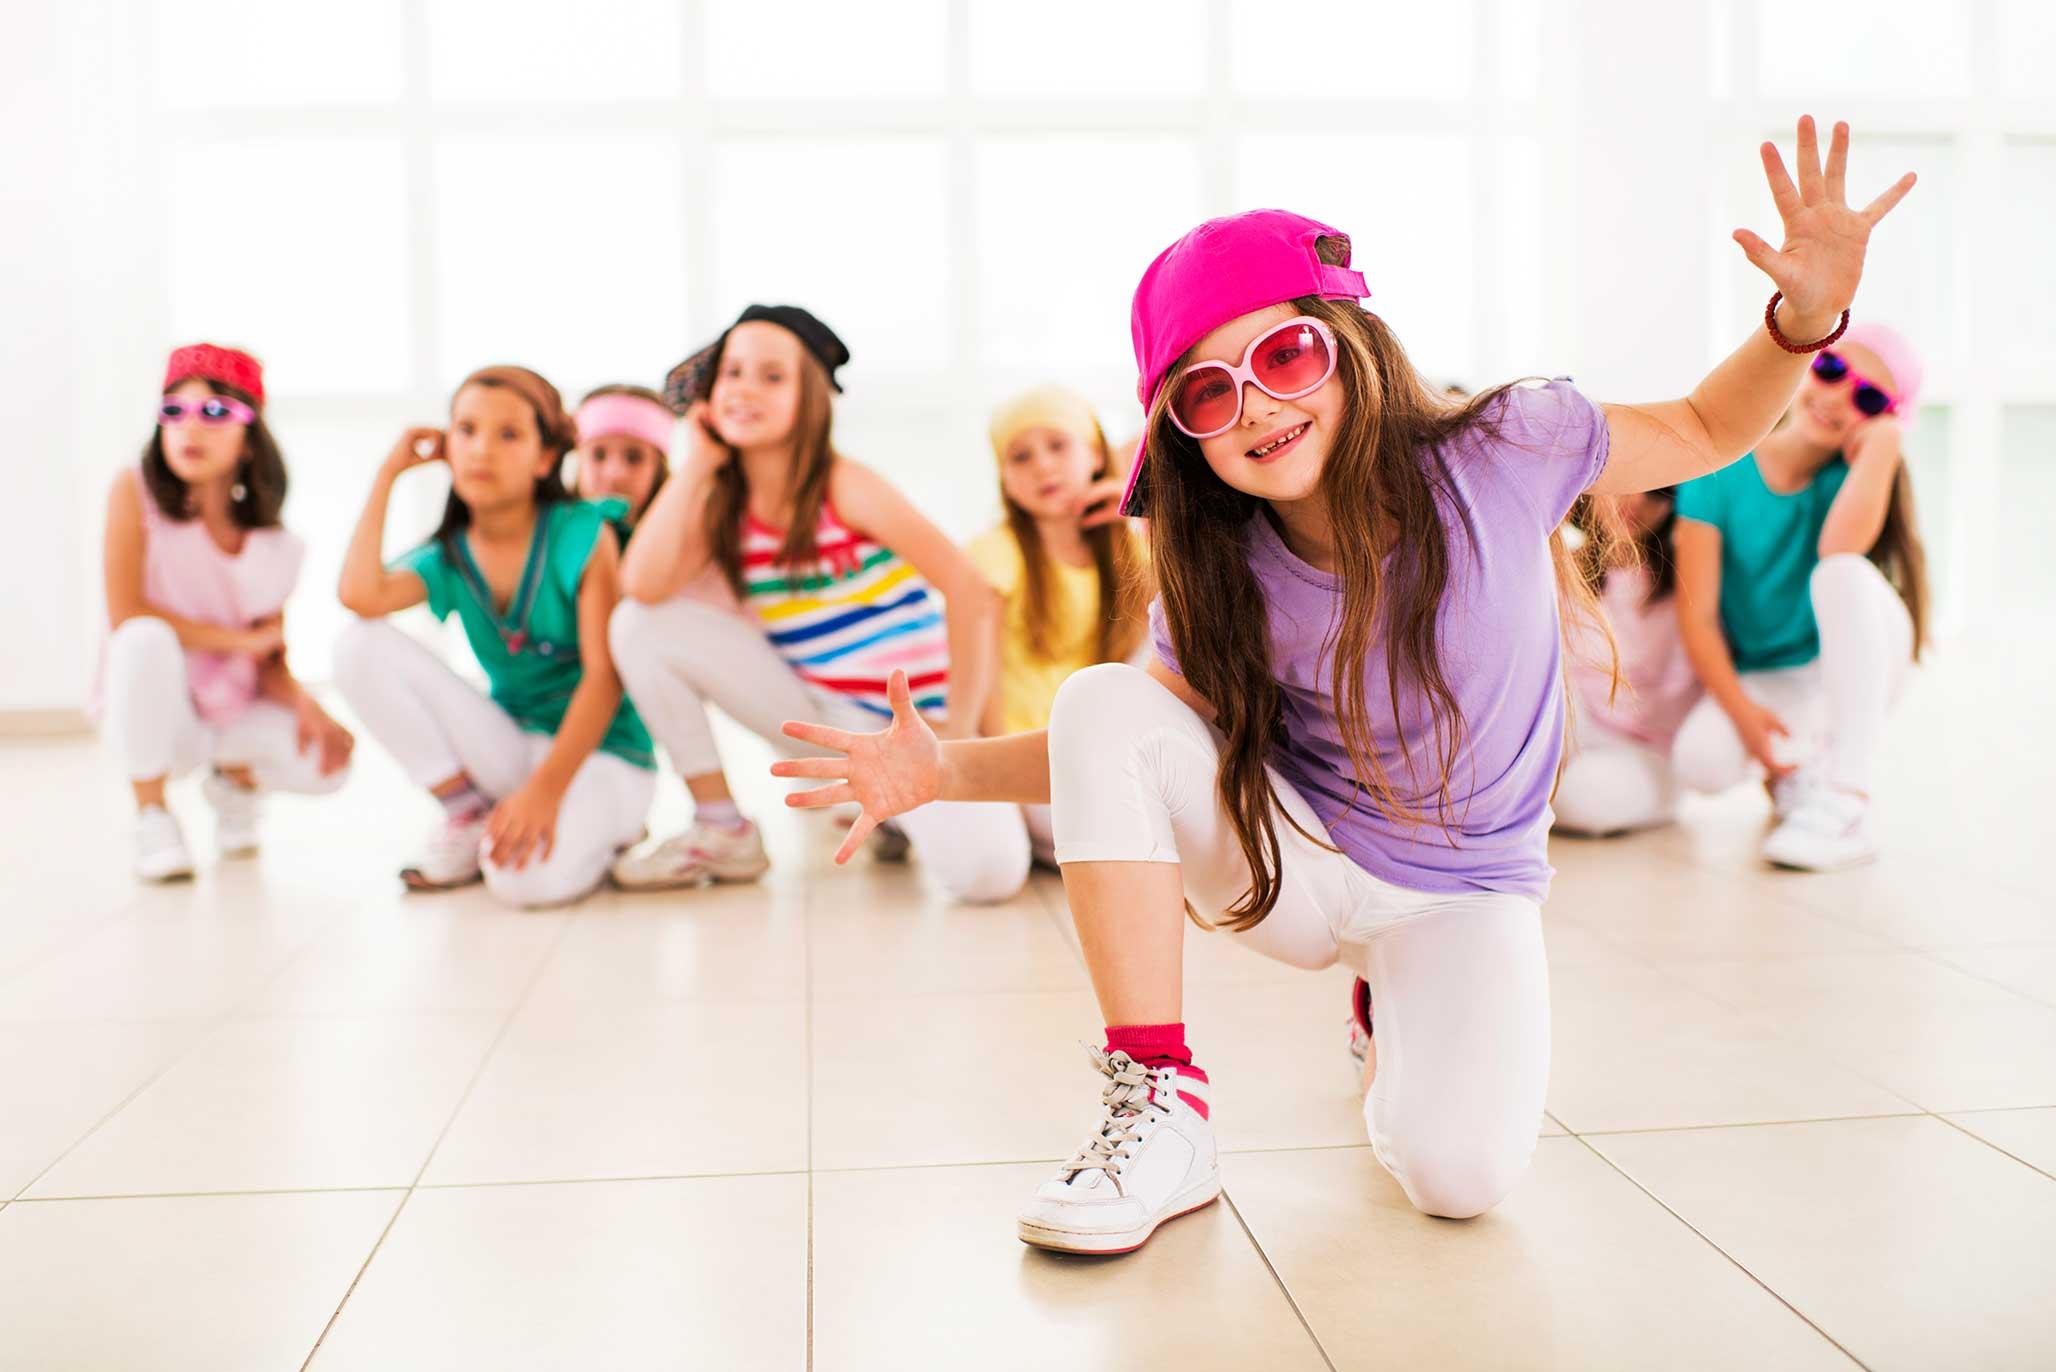 Child's interest in Dance